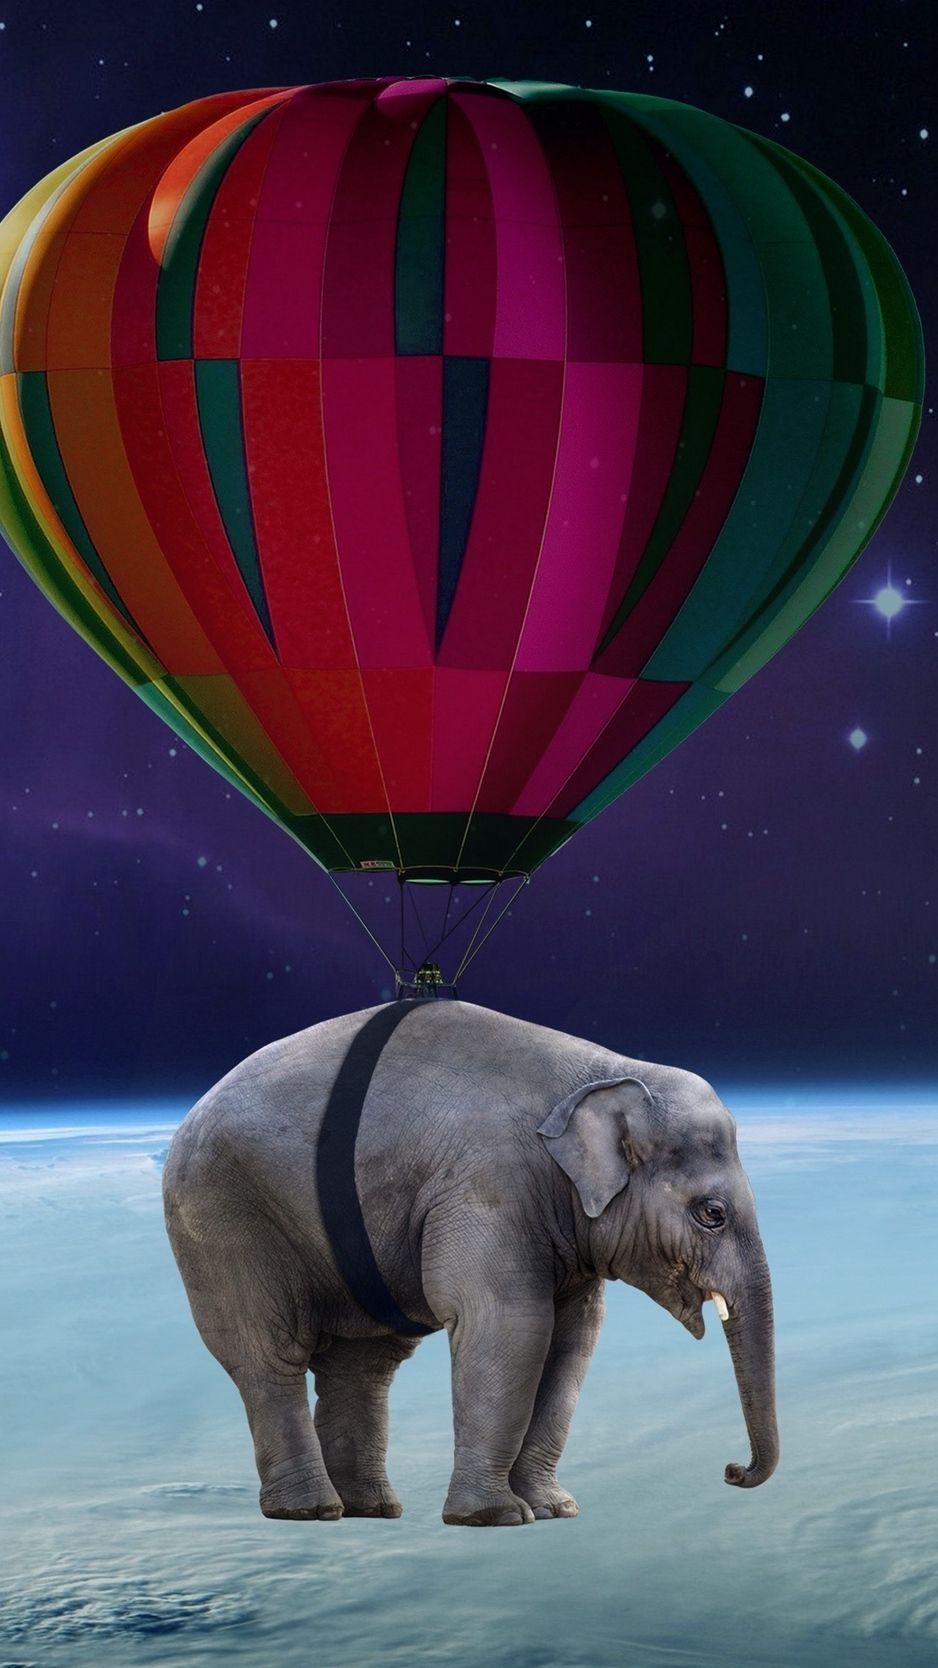 Elephant iPhone Wallpaper HD